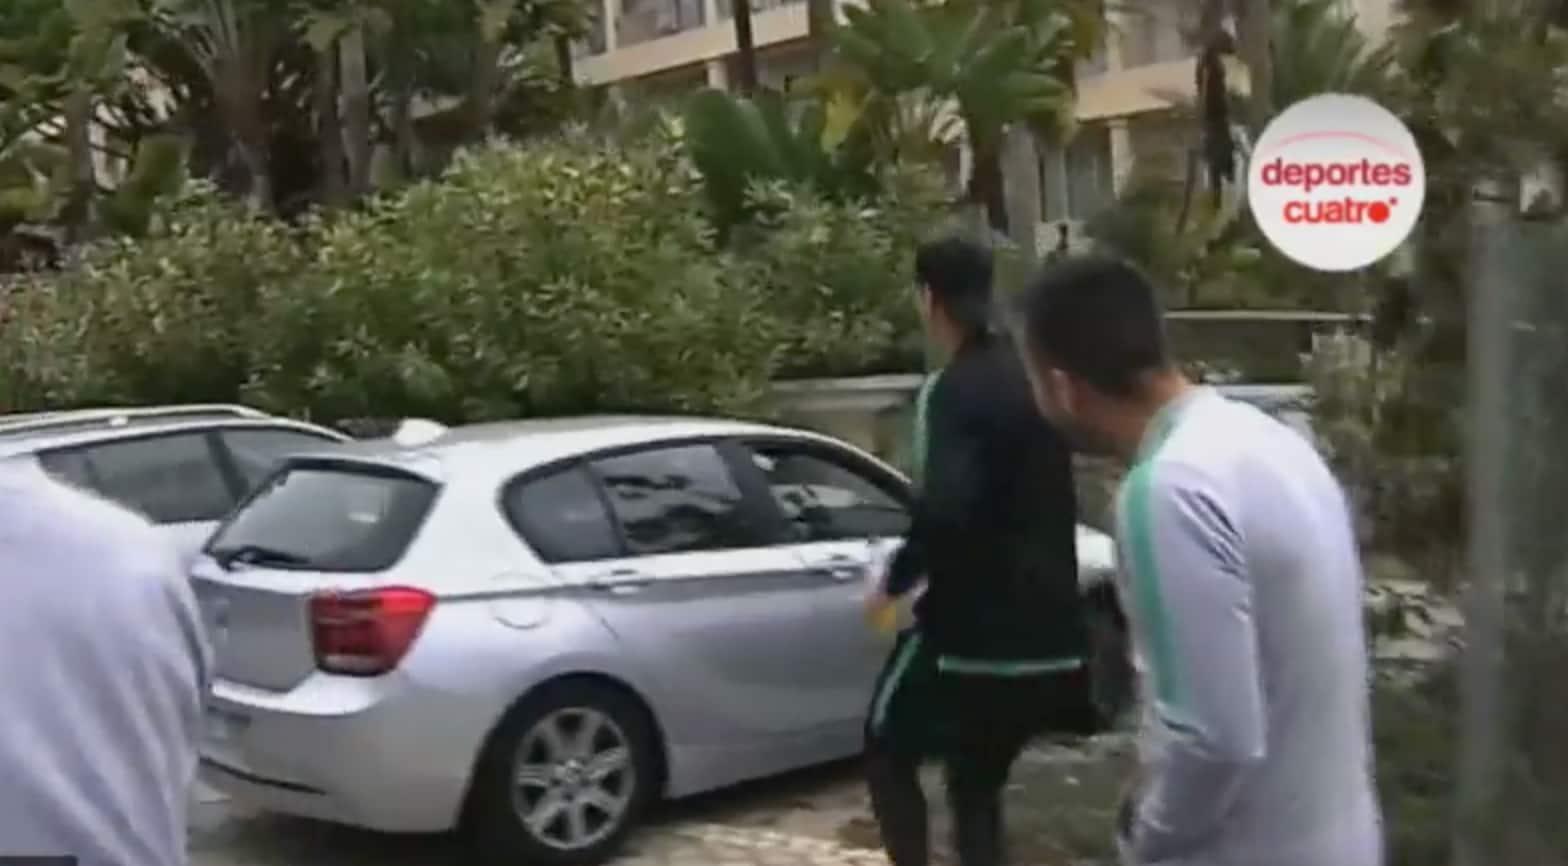 Cristiano Ronaldo Prega Susto Cristiano Ronaldo Assusta Casal Que O Gravava E Rouba-Lhes O Telemóvel